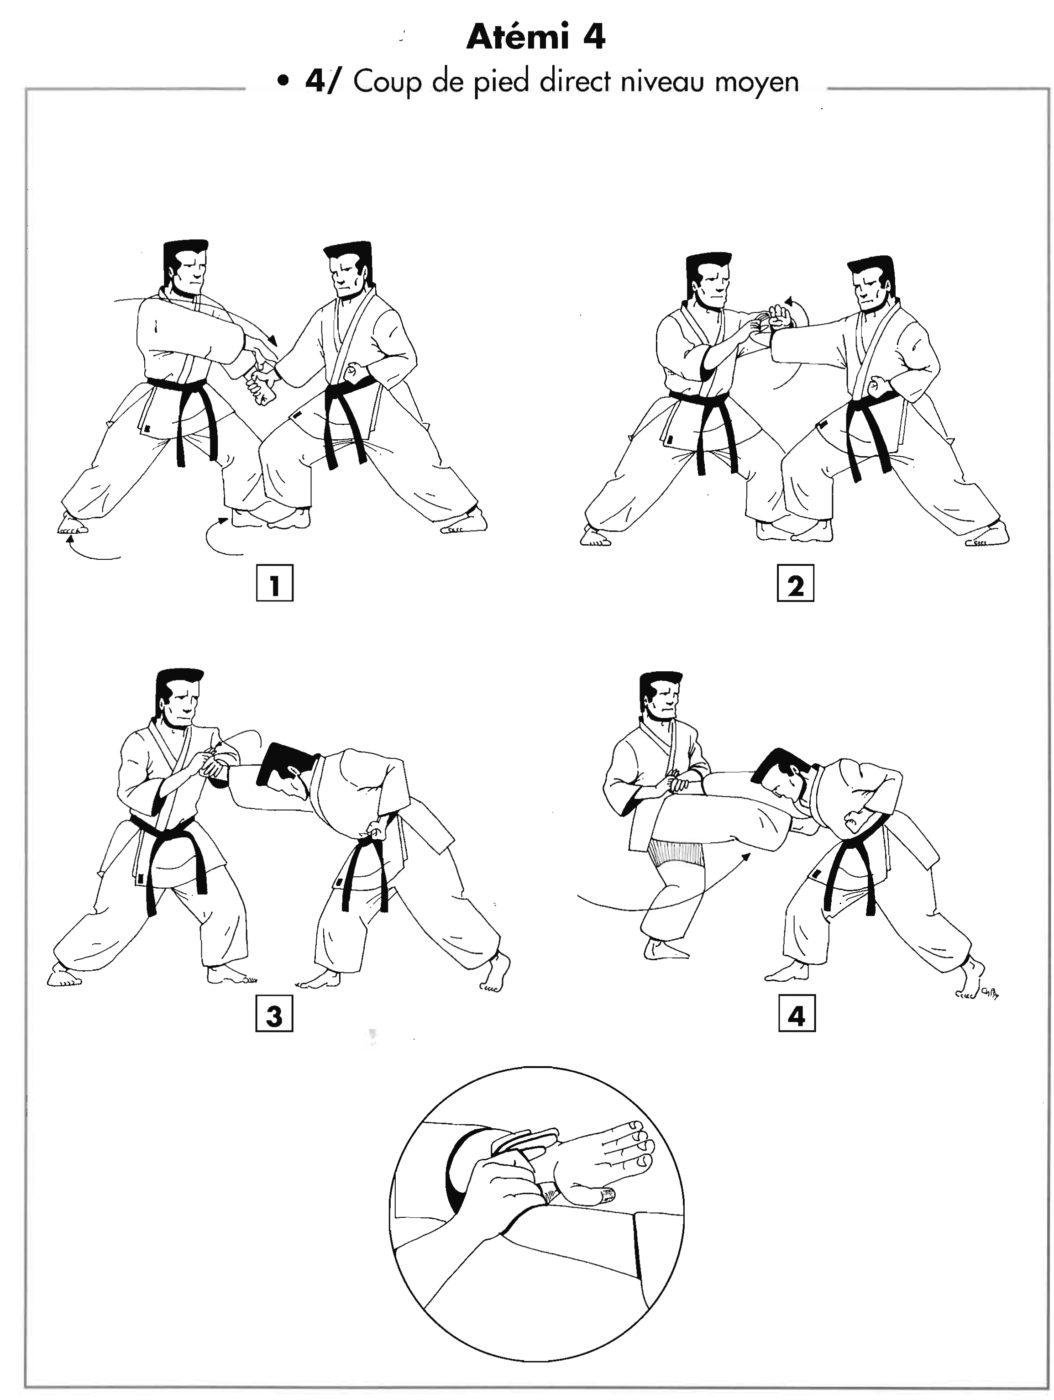 Atemi : chudan mae geri – coup de pied direct niveau moyen